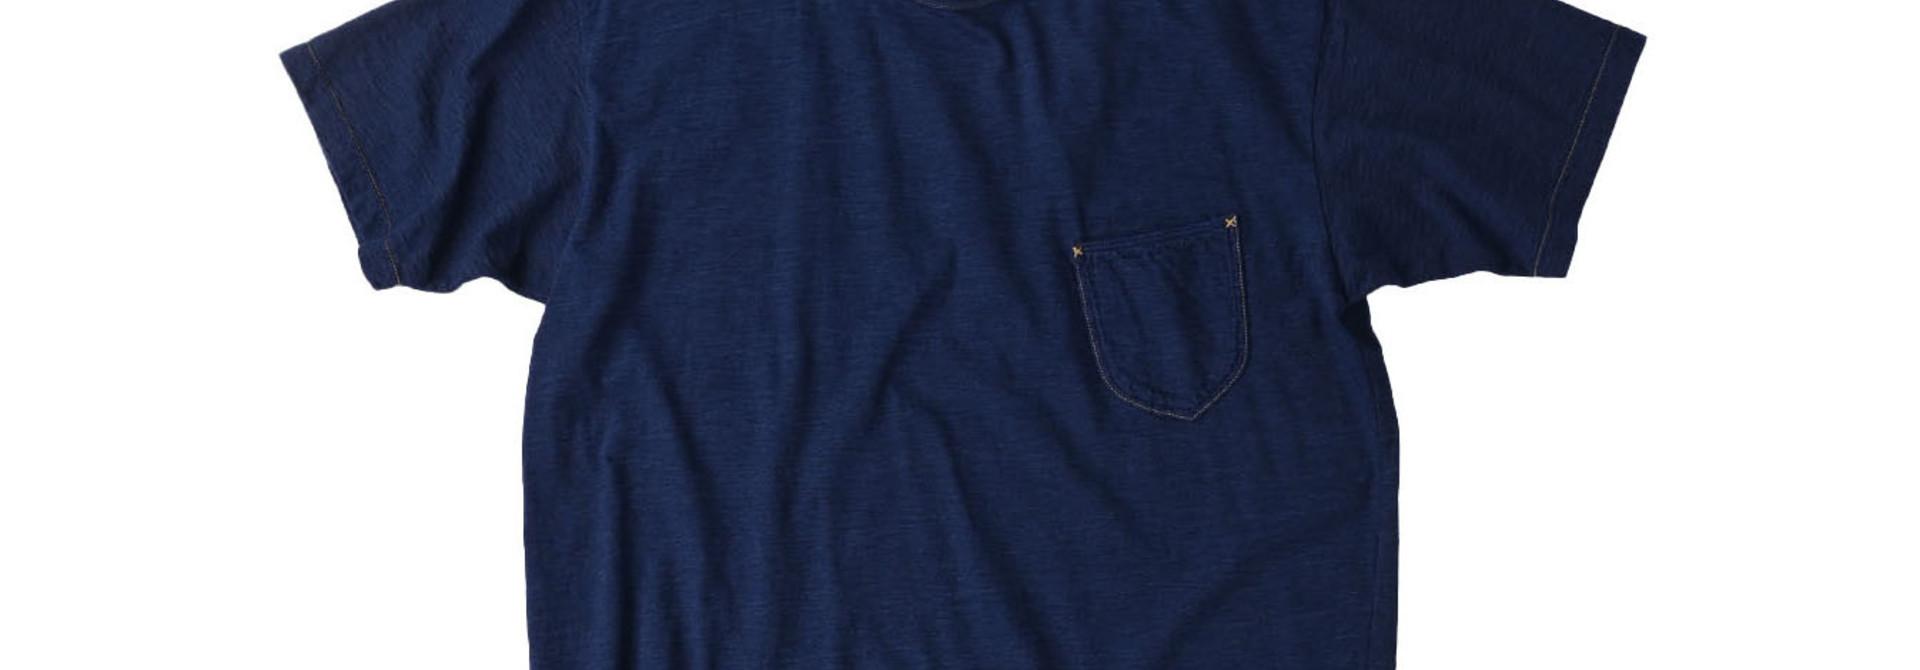 One Wash Indigo Tenjiku 908 Ocean T-Shirt (0621)